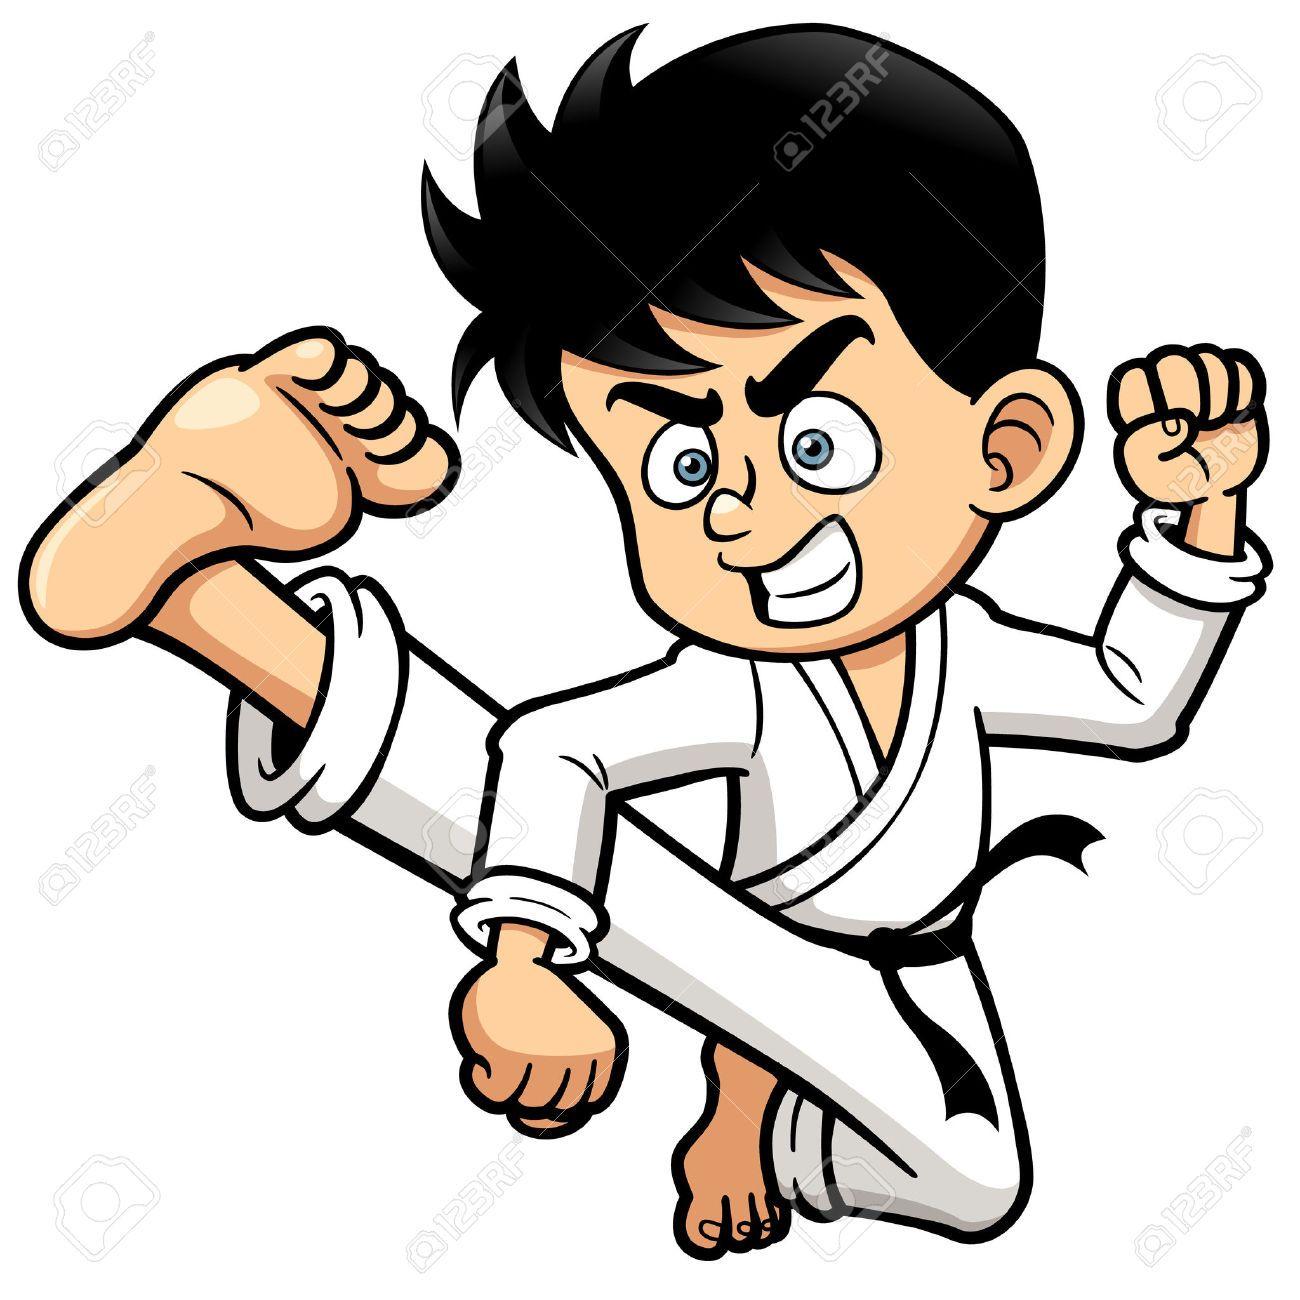 kartka z motywem karate - Szukaj w Google | OBRAZKI | Pinterest